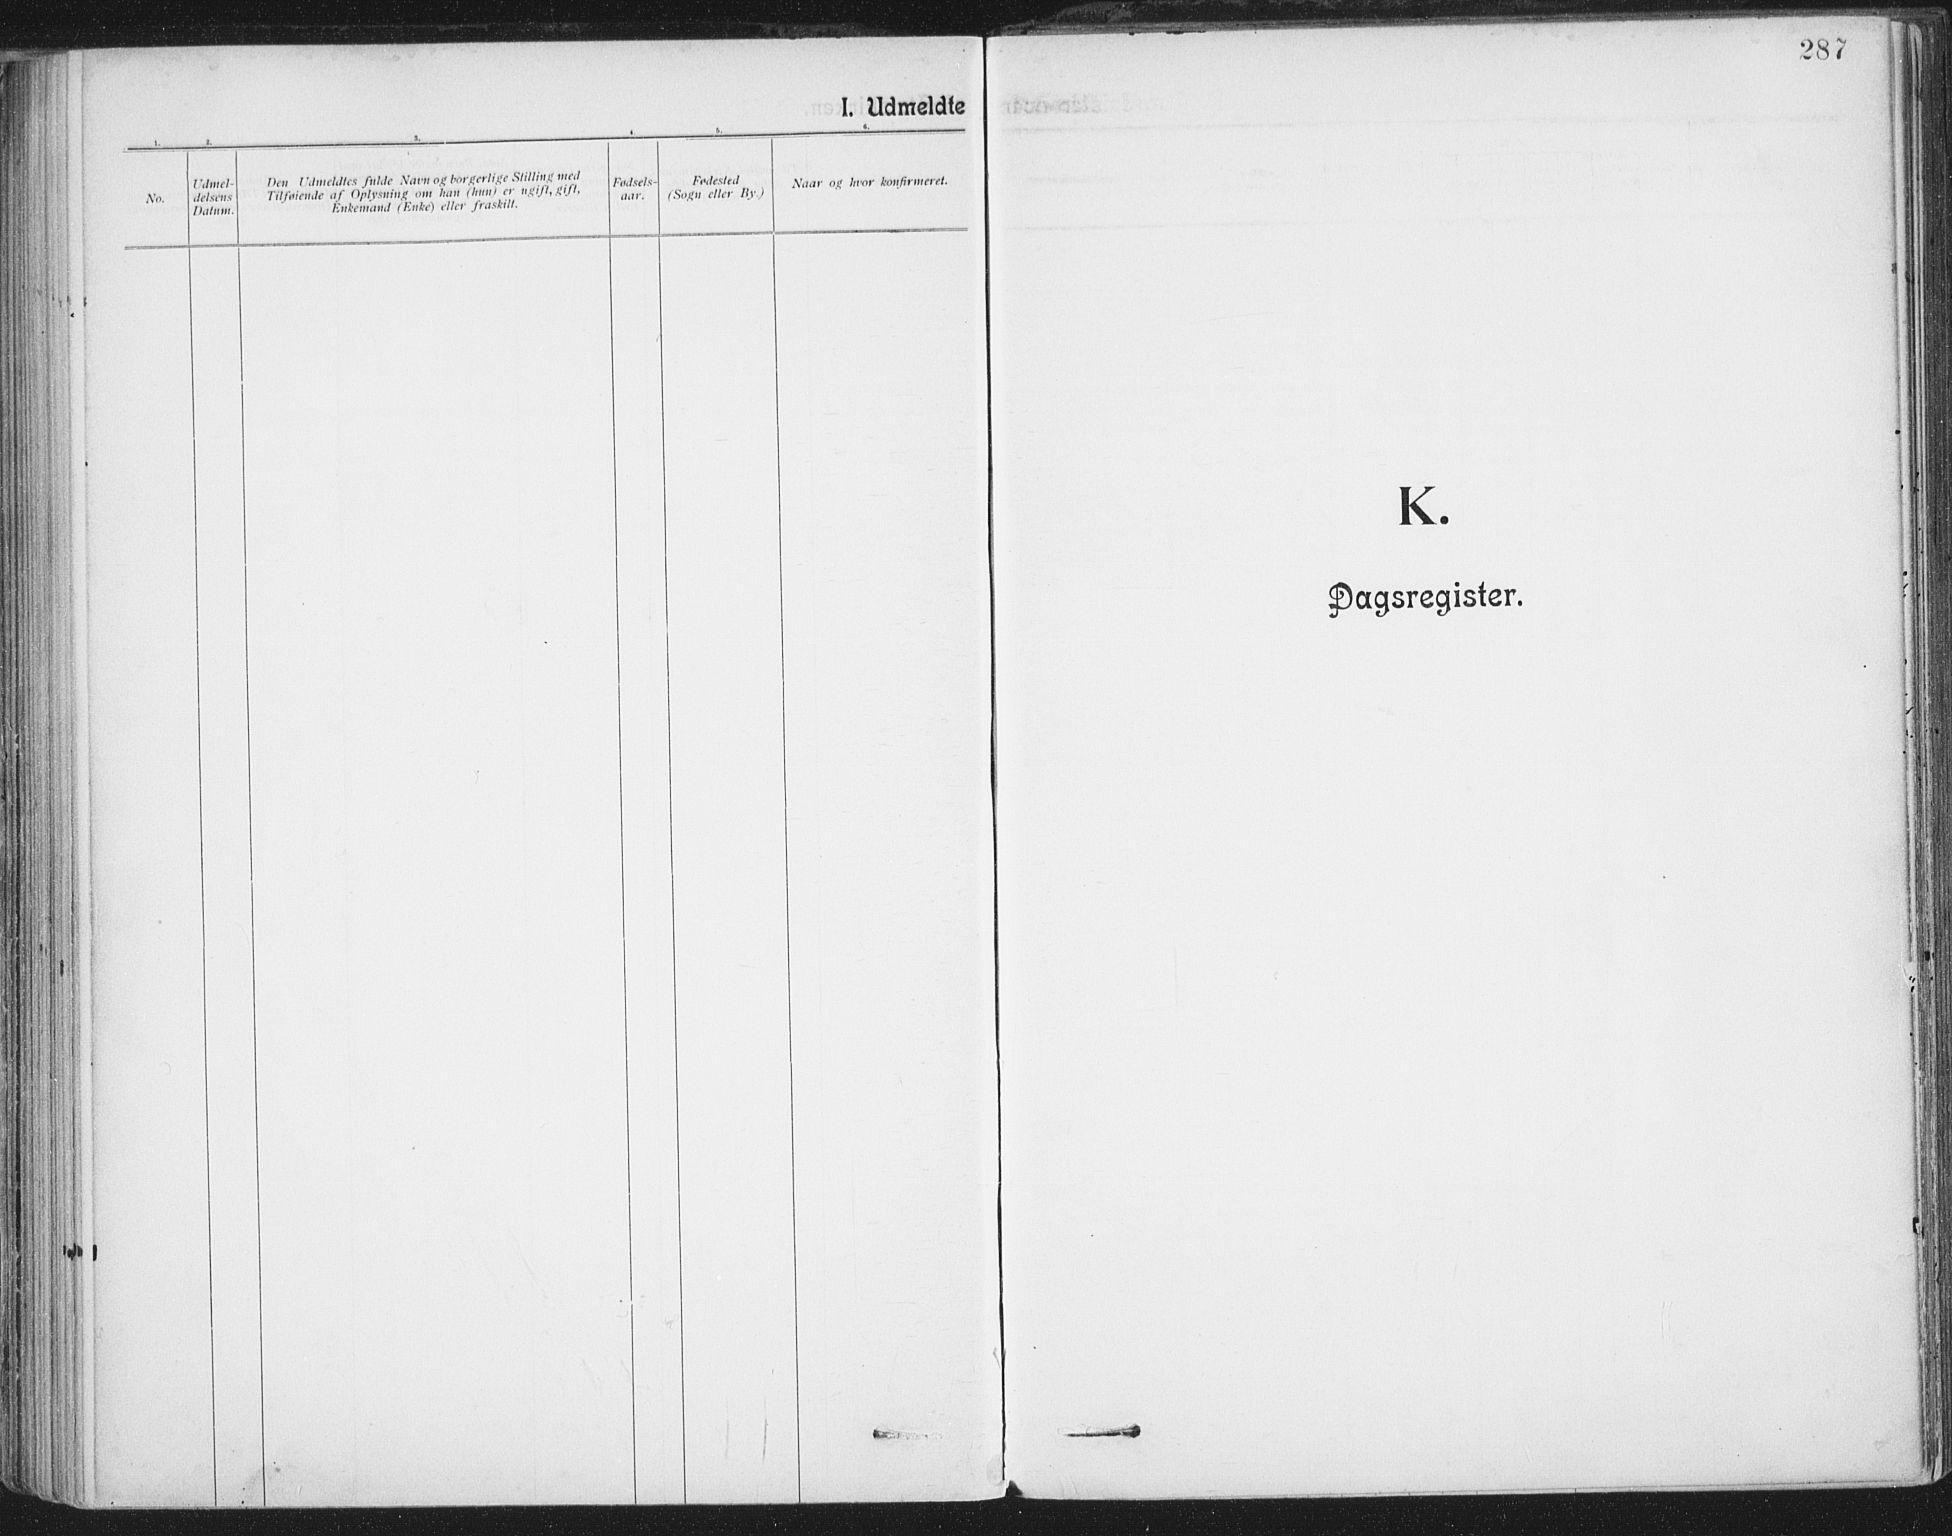 SAT, Ministerialprotokoller, klokkerbøker og fødselsregistre - Nordland, 801/L0012: Ministerialbok nr. 801A12, 1900-1916, s. 287